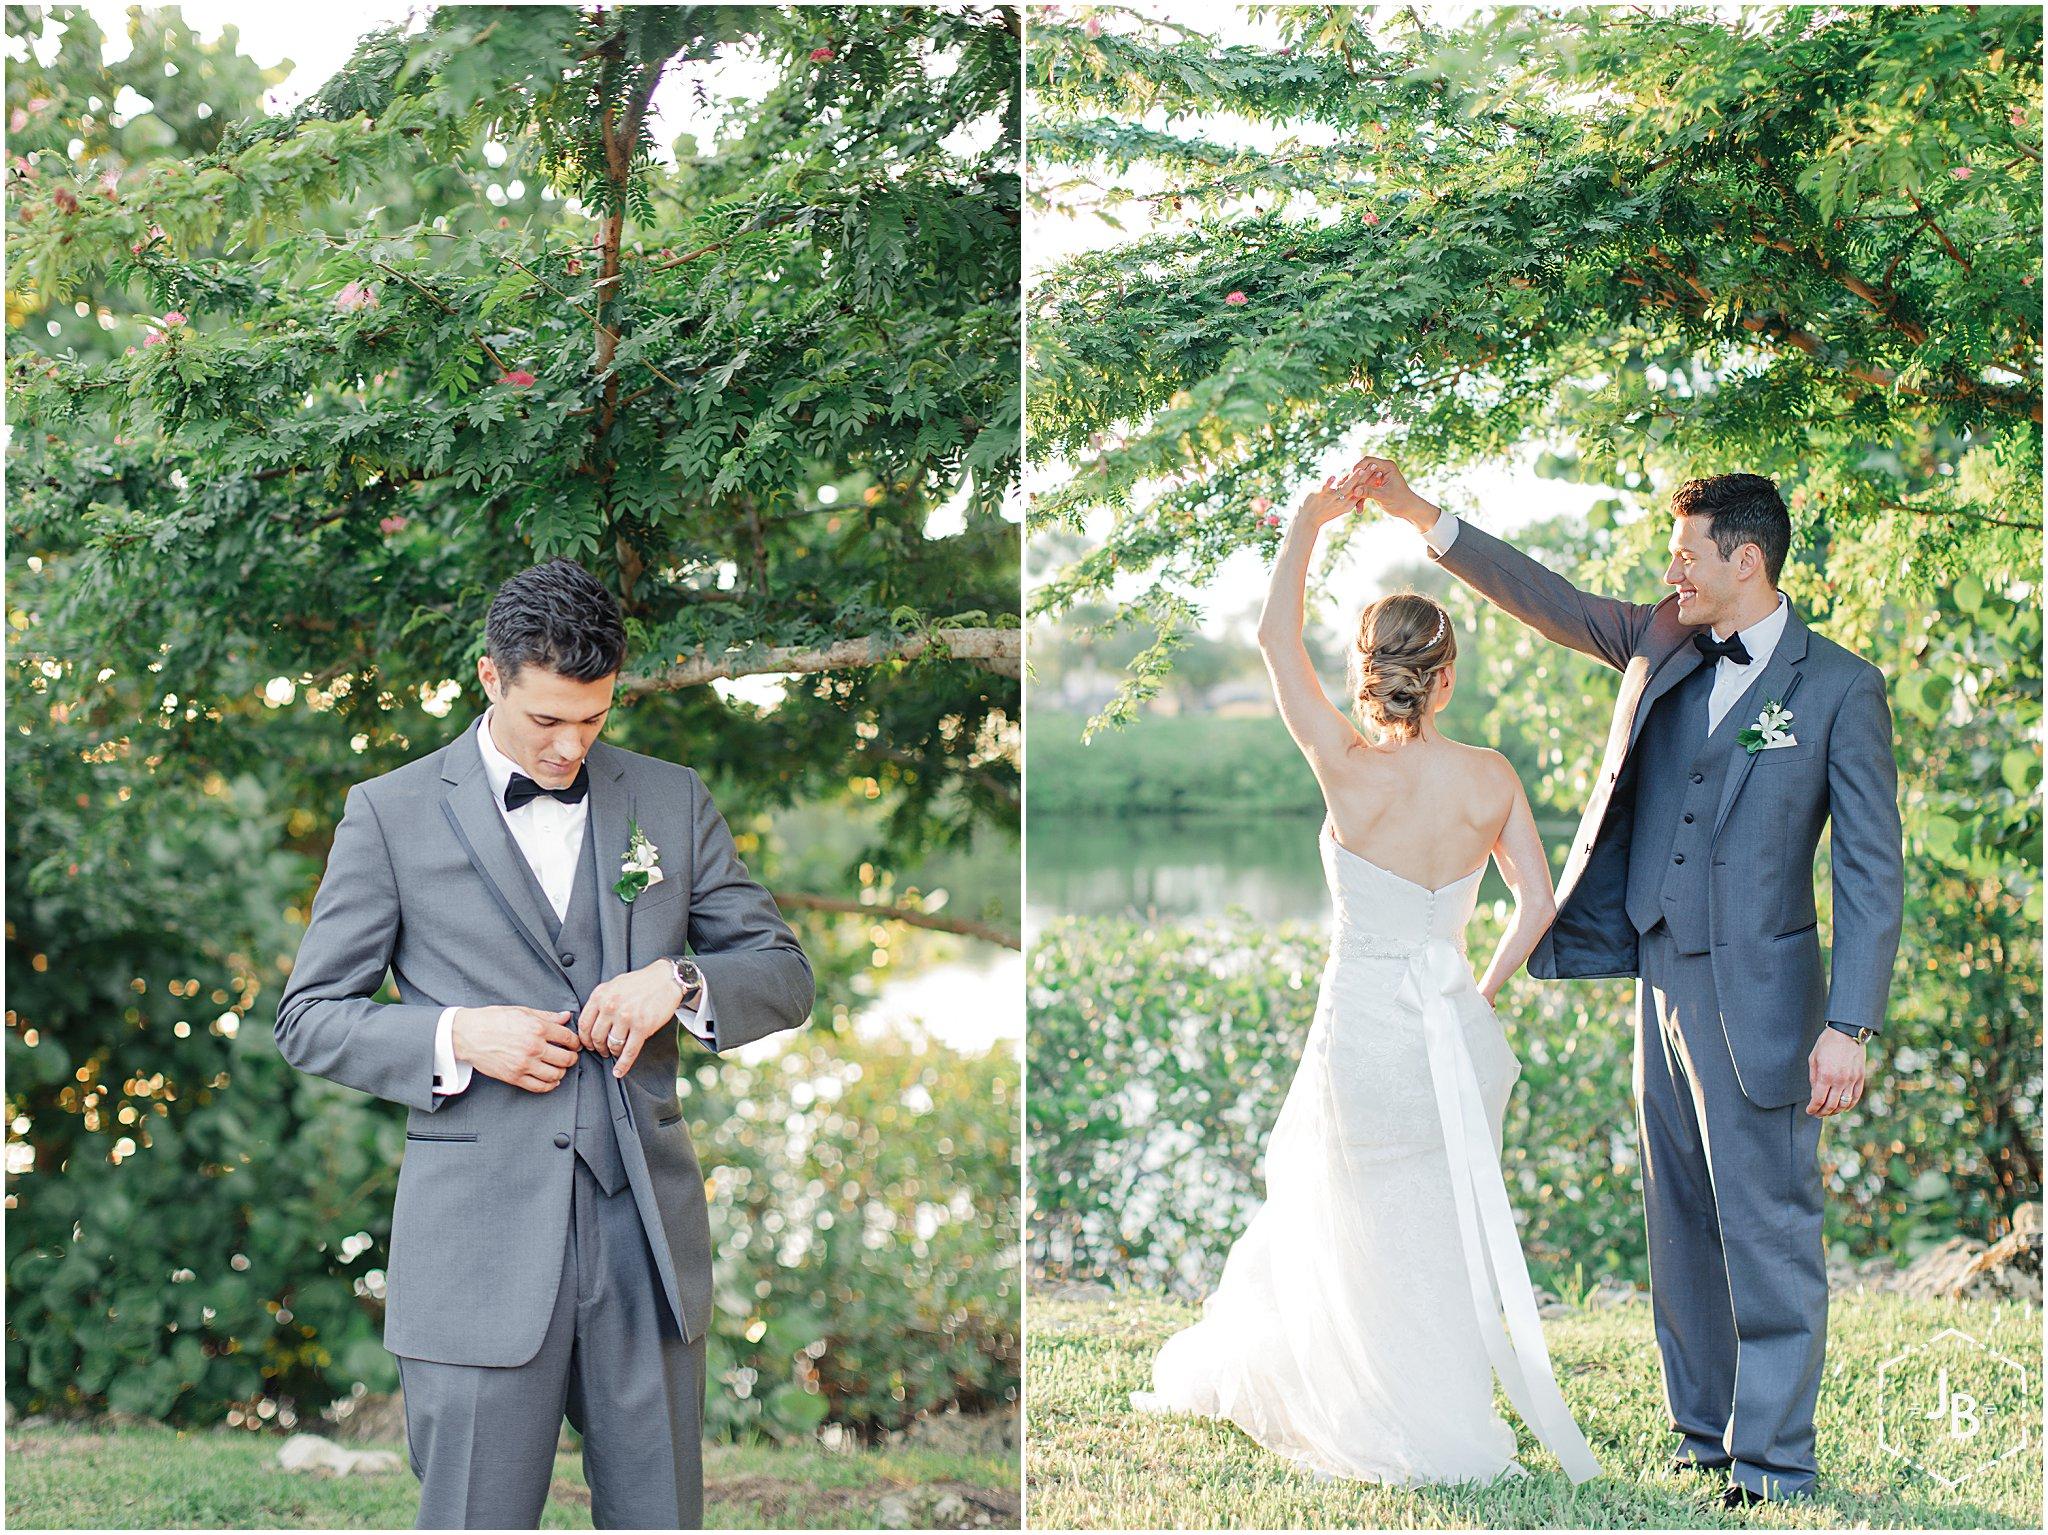 WeddingandEngagementFloridaPhotographer_0372.jpg